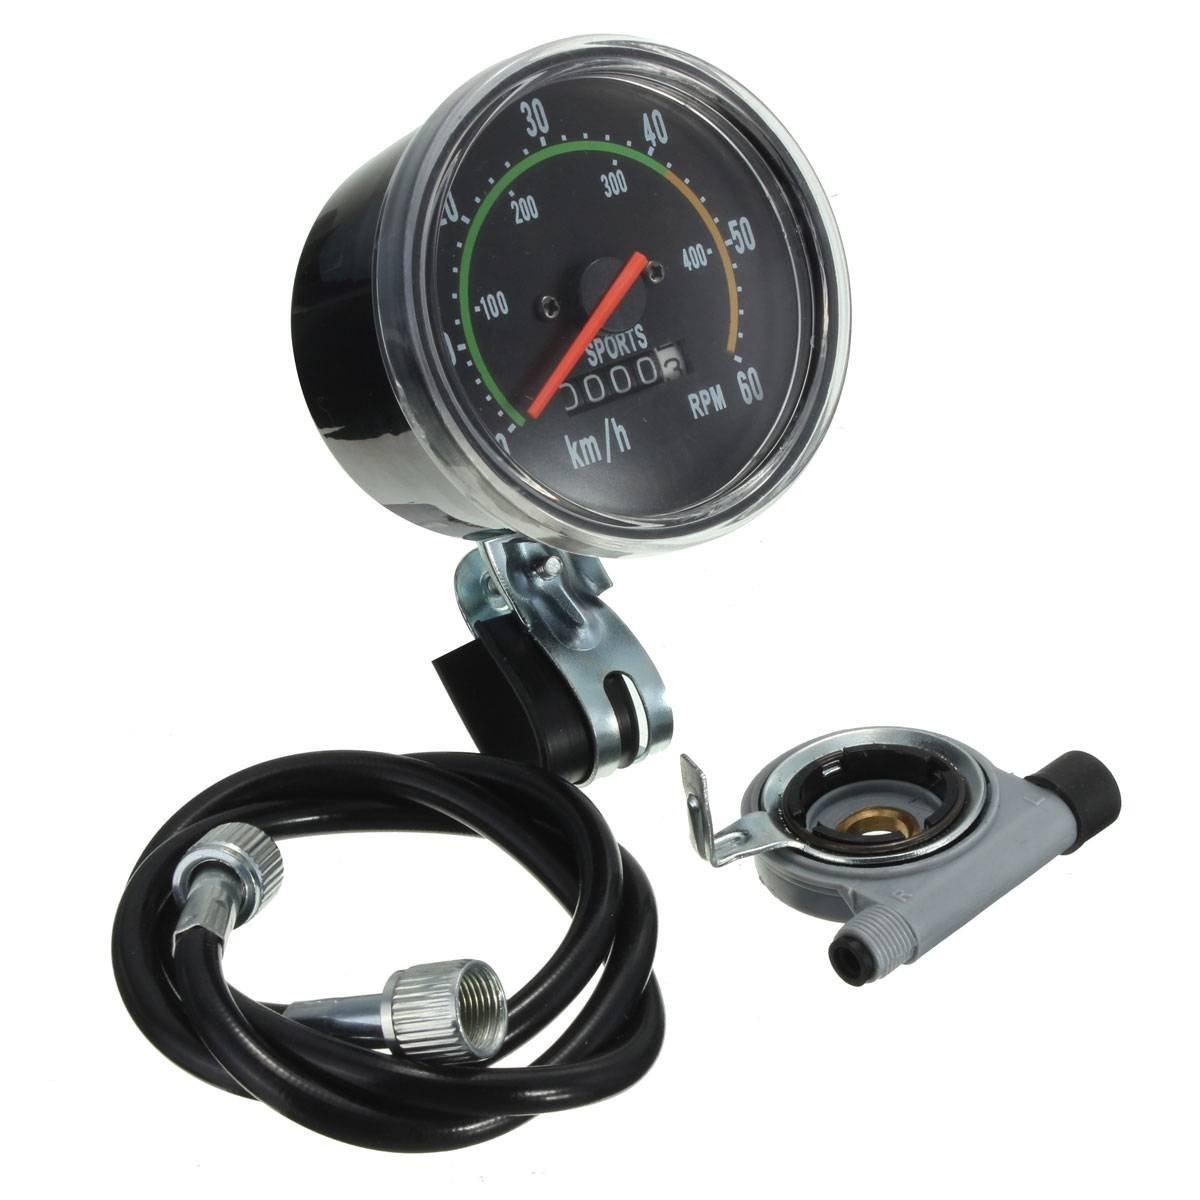 Amazon.com : OUTERDO Bike Speedometer Odometer Bicycle Stopwatch ...